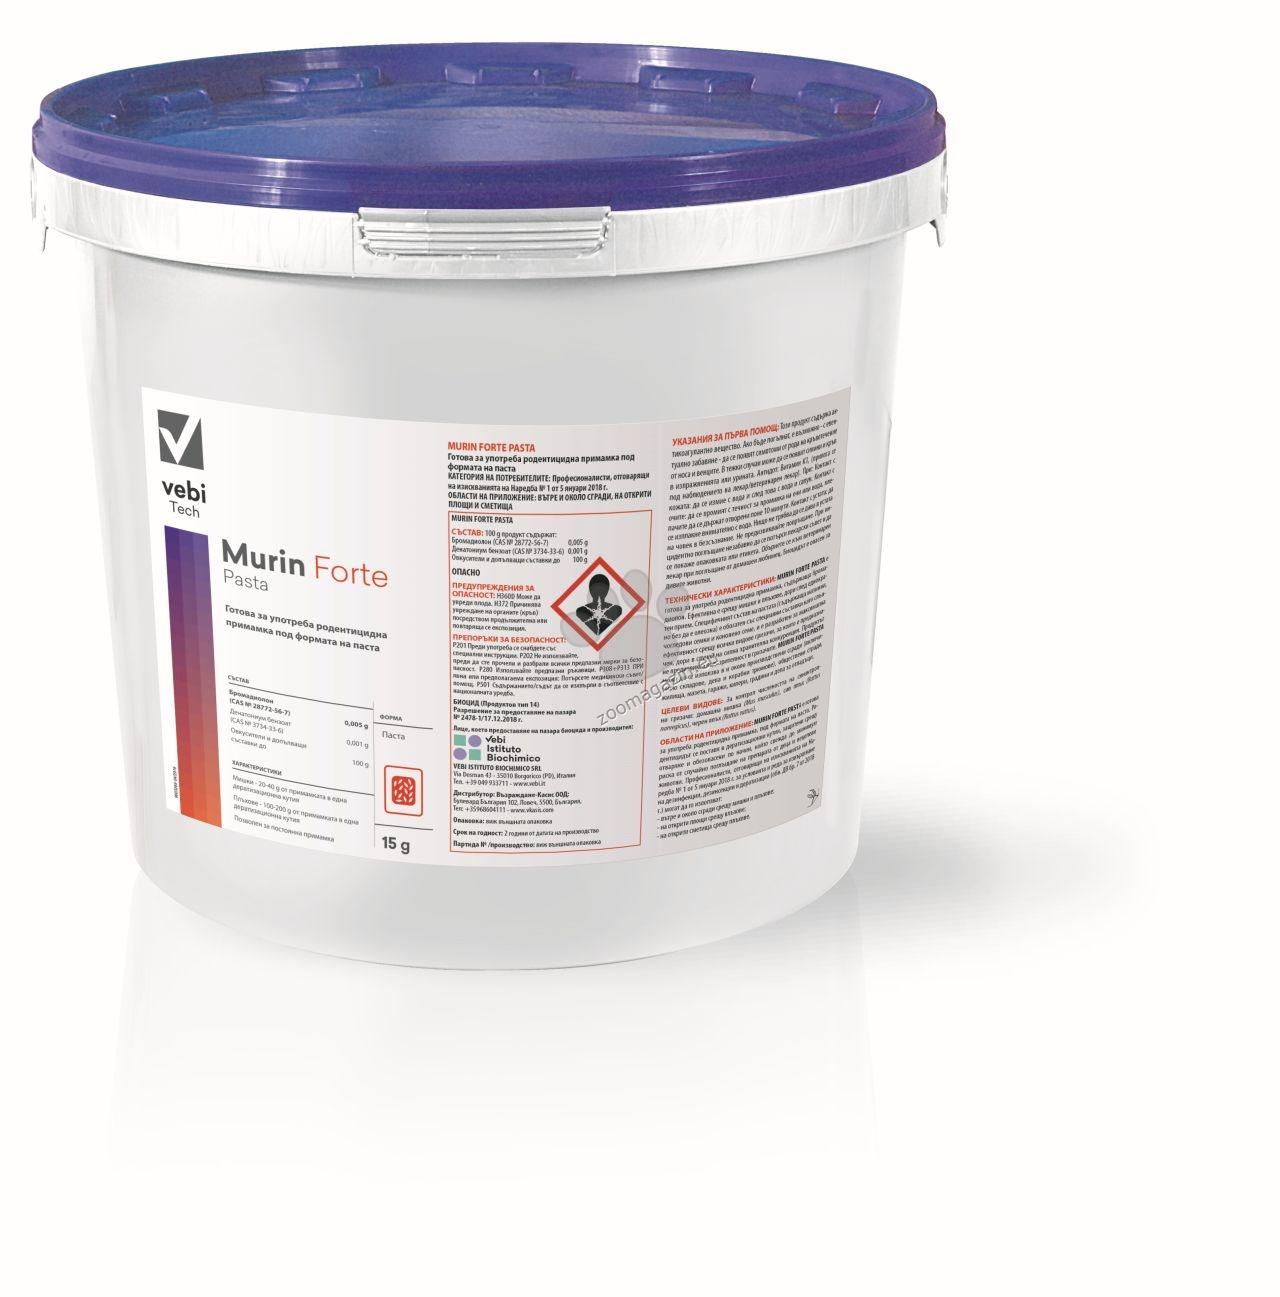 Мurin Forte Pasta - Готова за употреба родентицидка примамки за професионална употреба 10 кг.